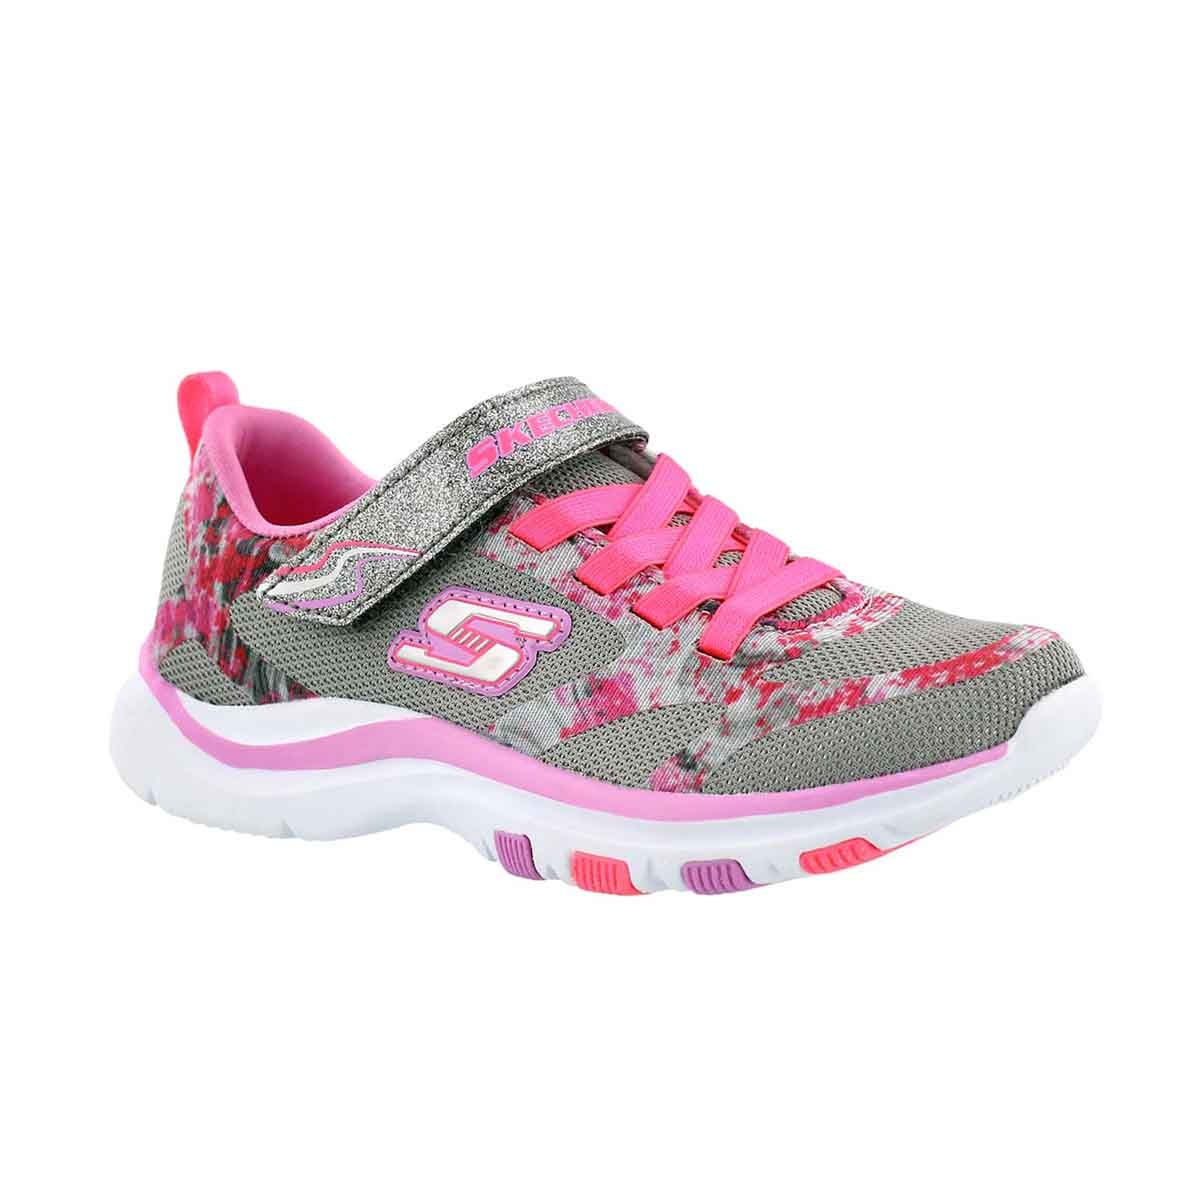 Girls' TRAINER LITE grey/pink sneakers